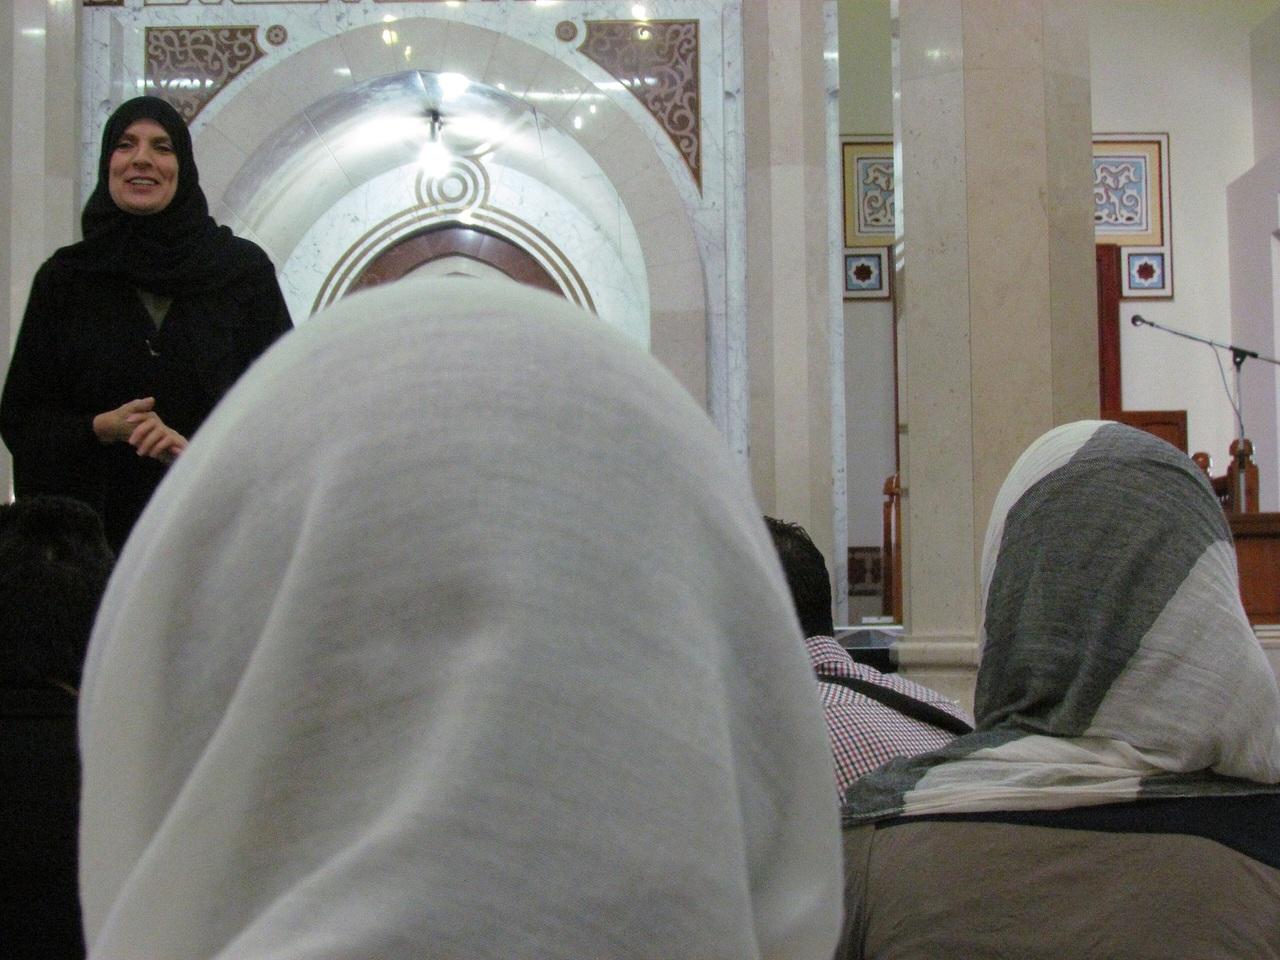 Pray like a muslim.    Aqui .